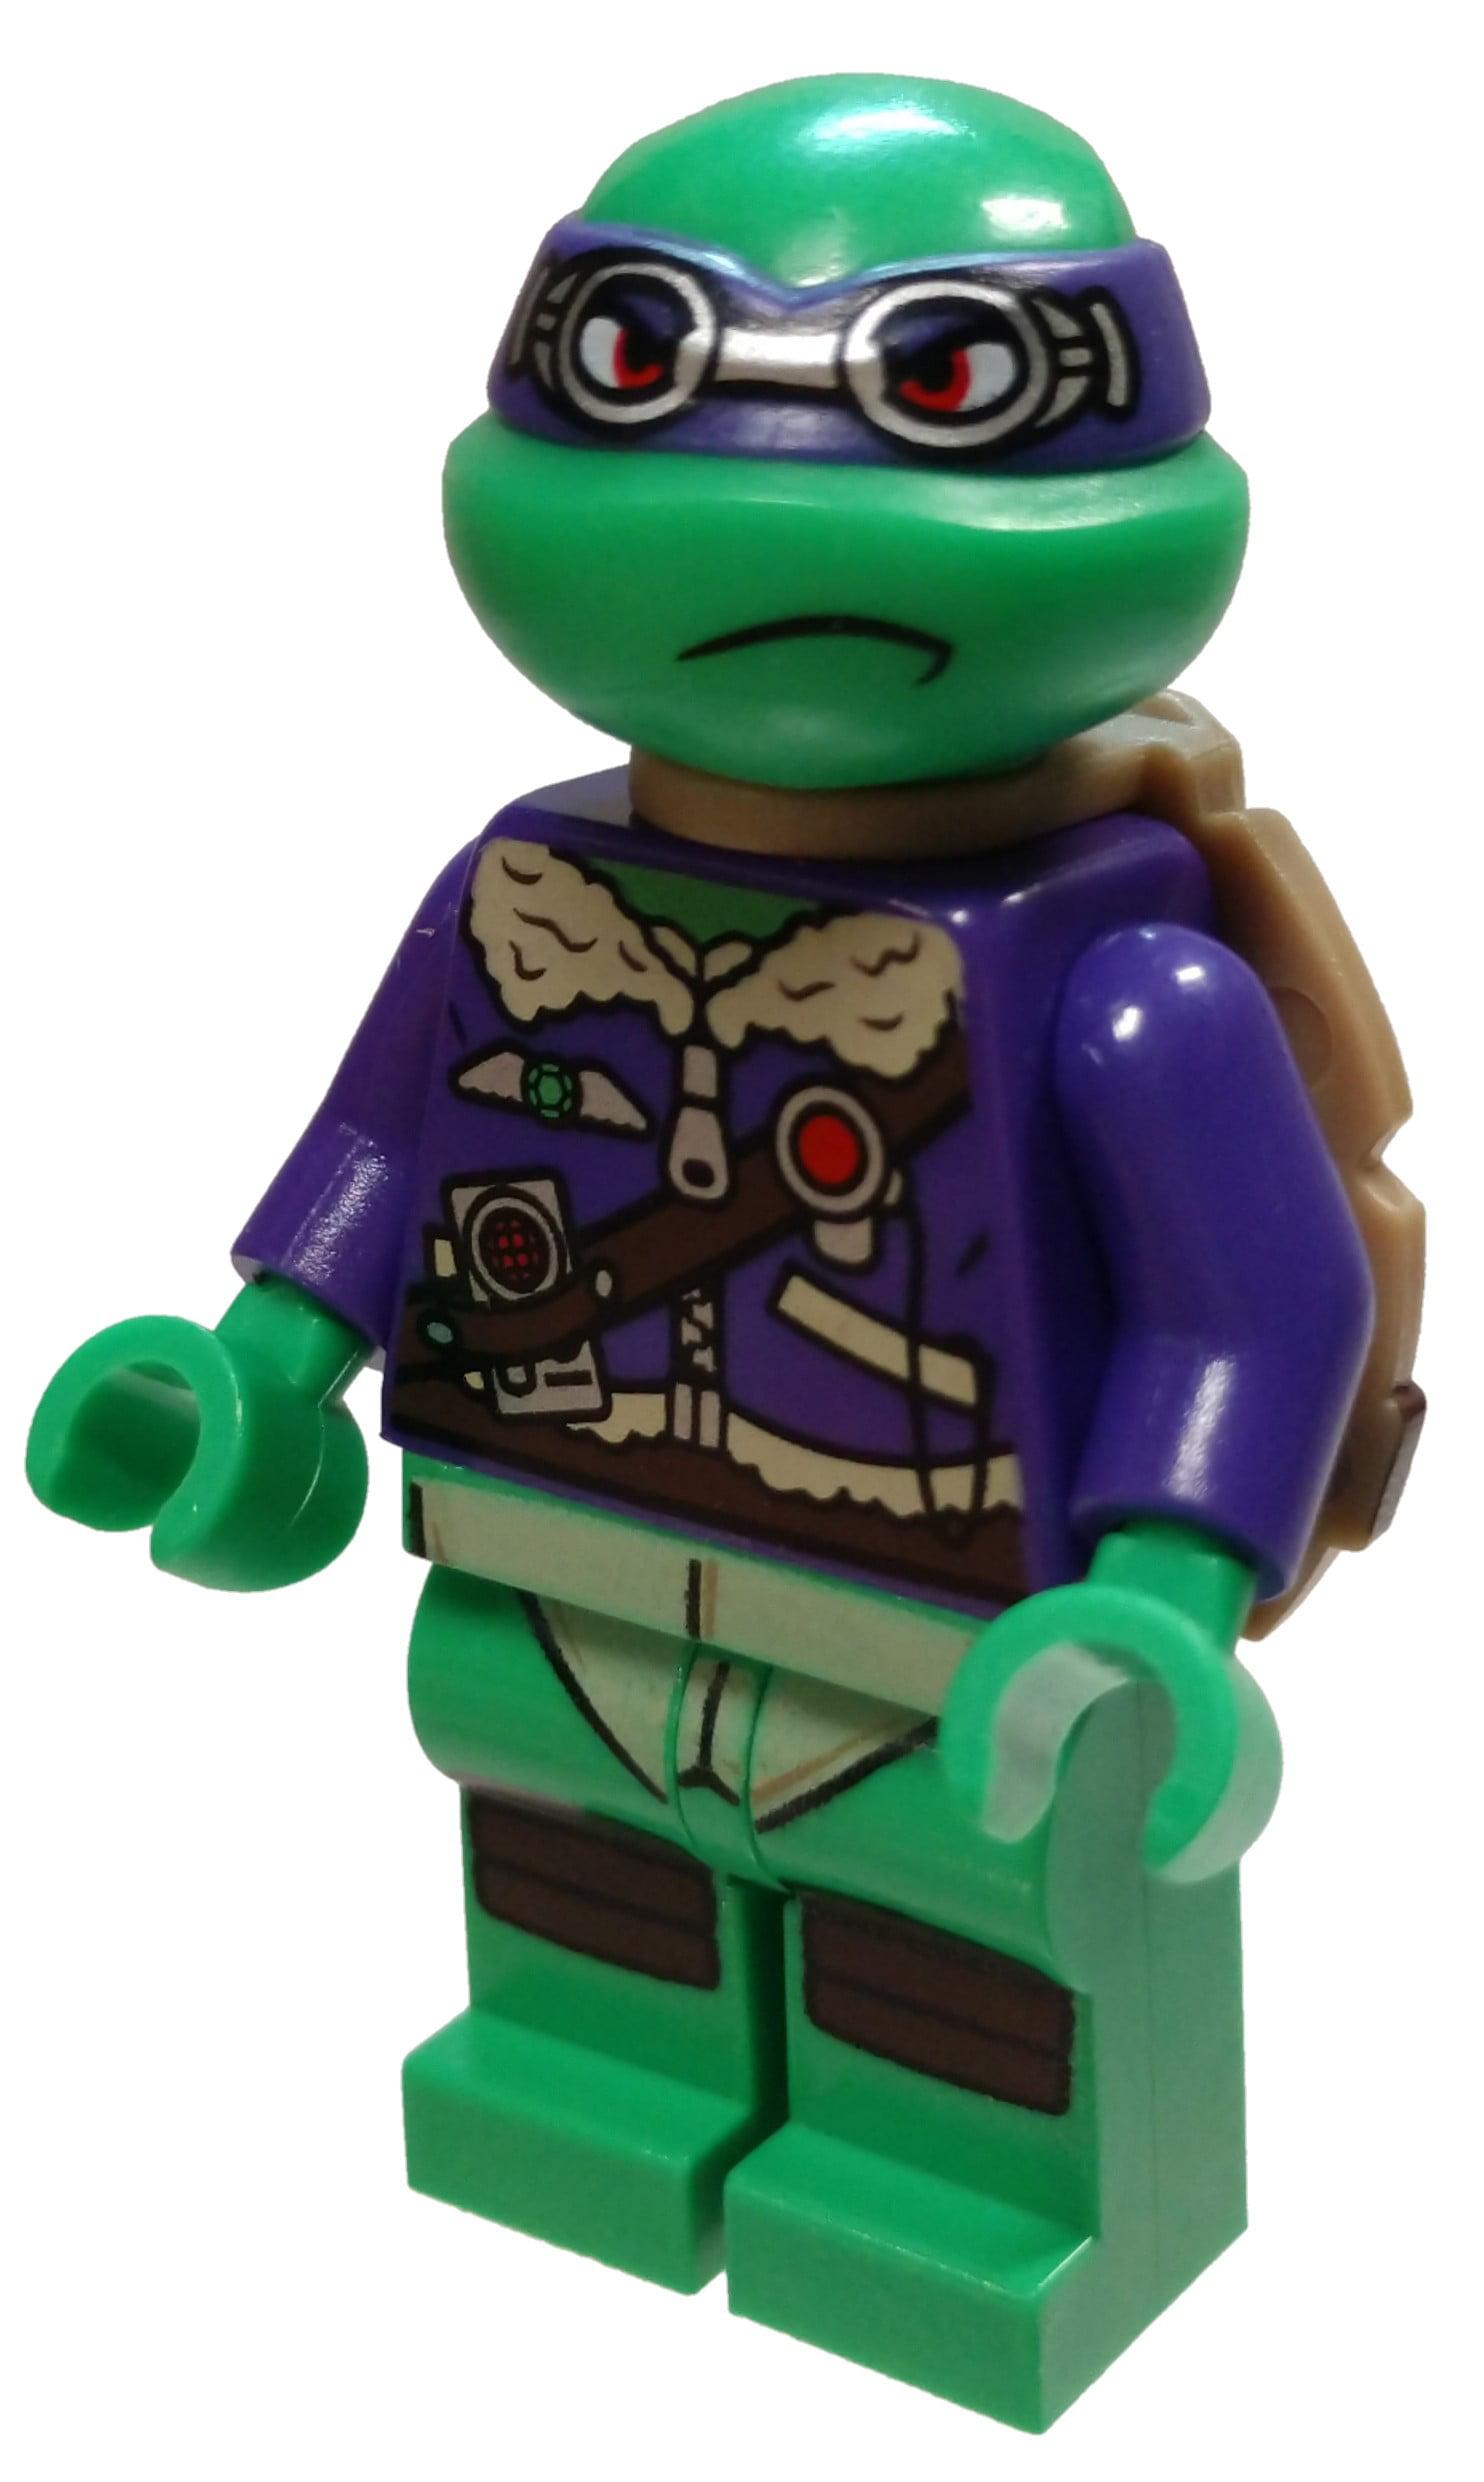 Lego Teenage Mutant Ninja Turtle Donatello Children/'s Bedroom Decal Wall Sticker